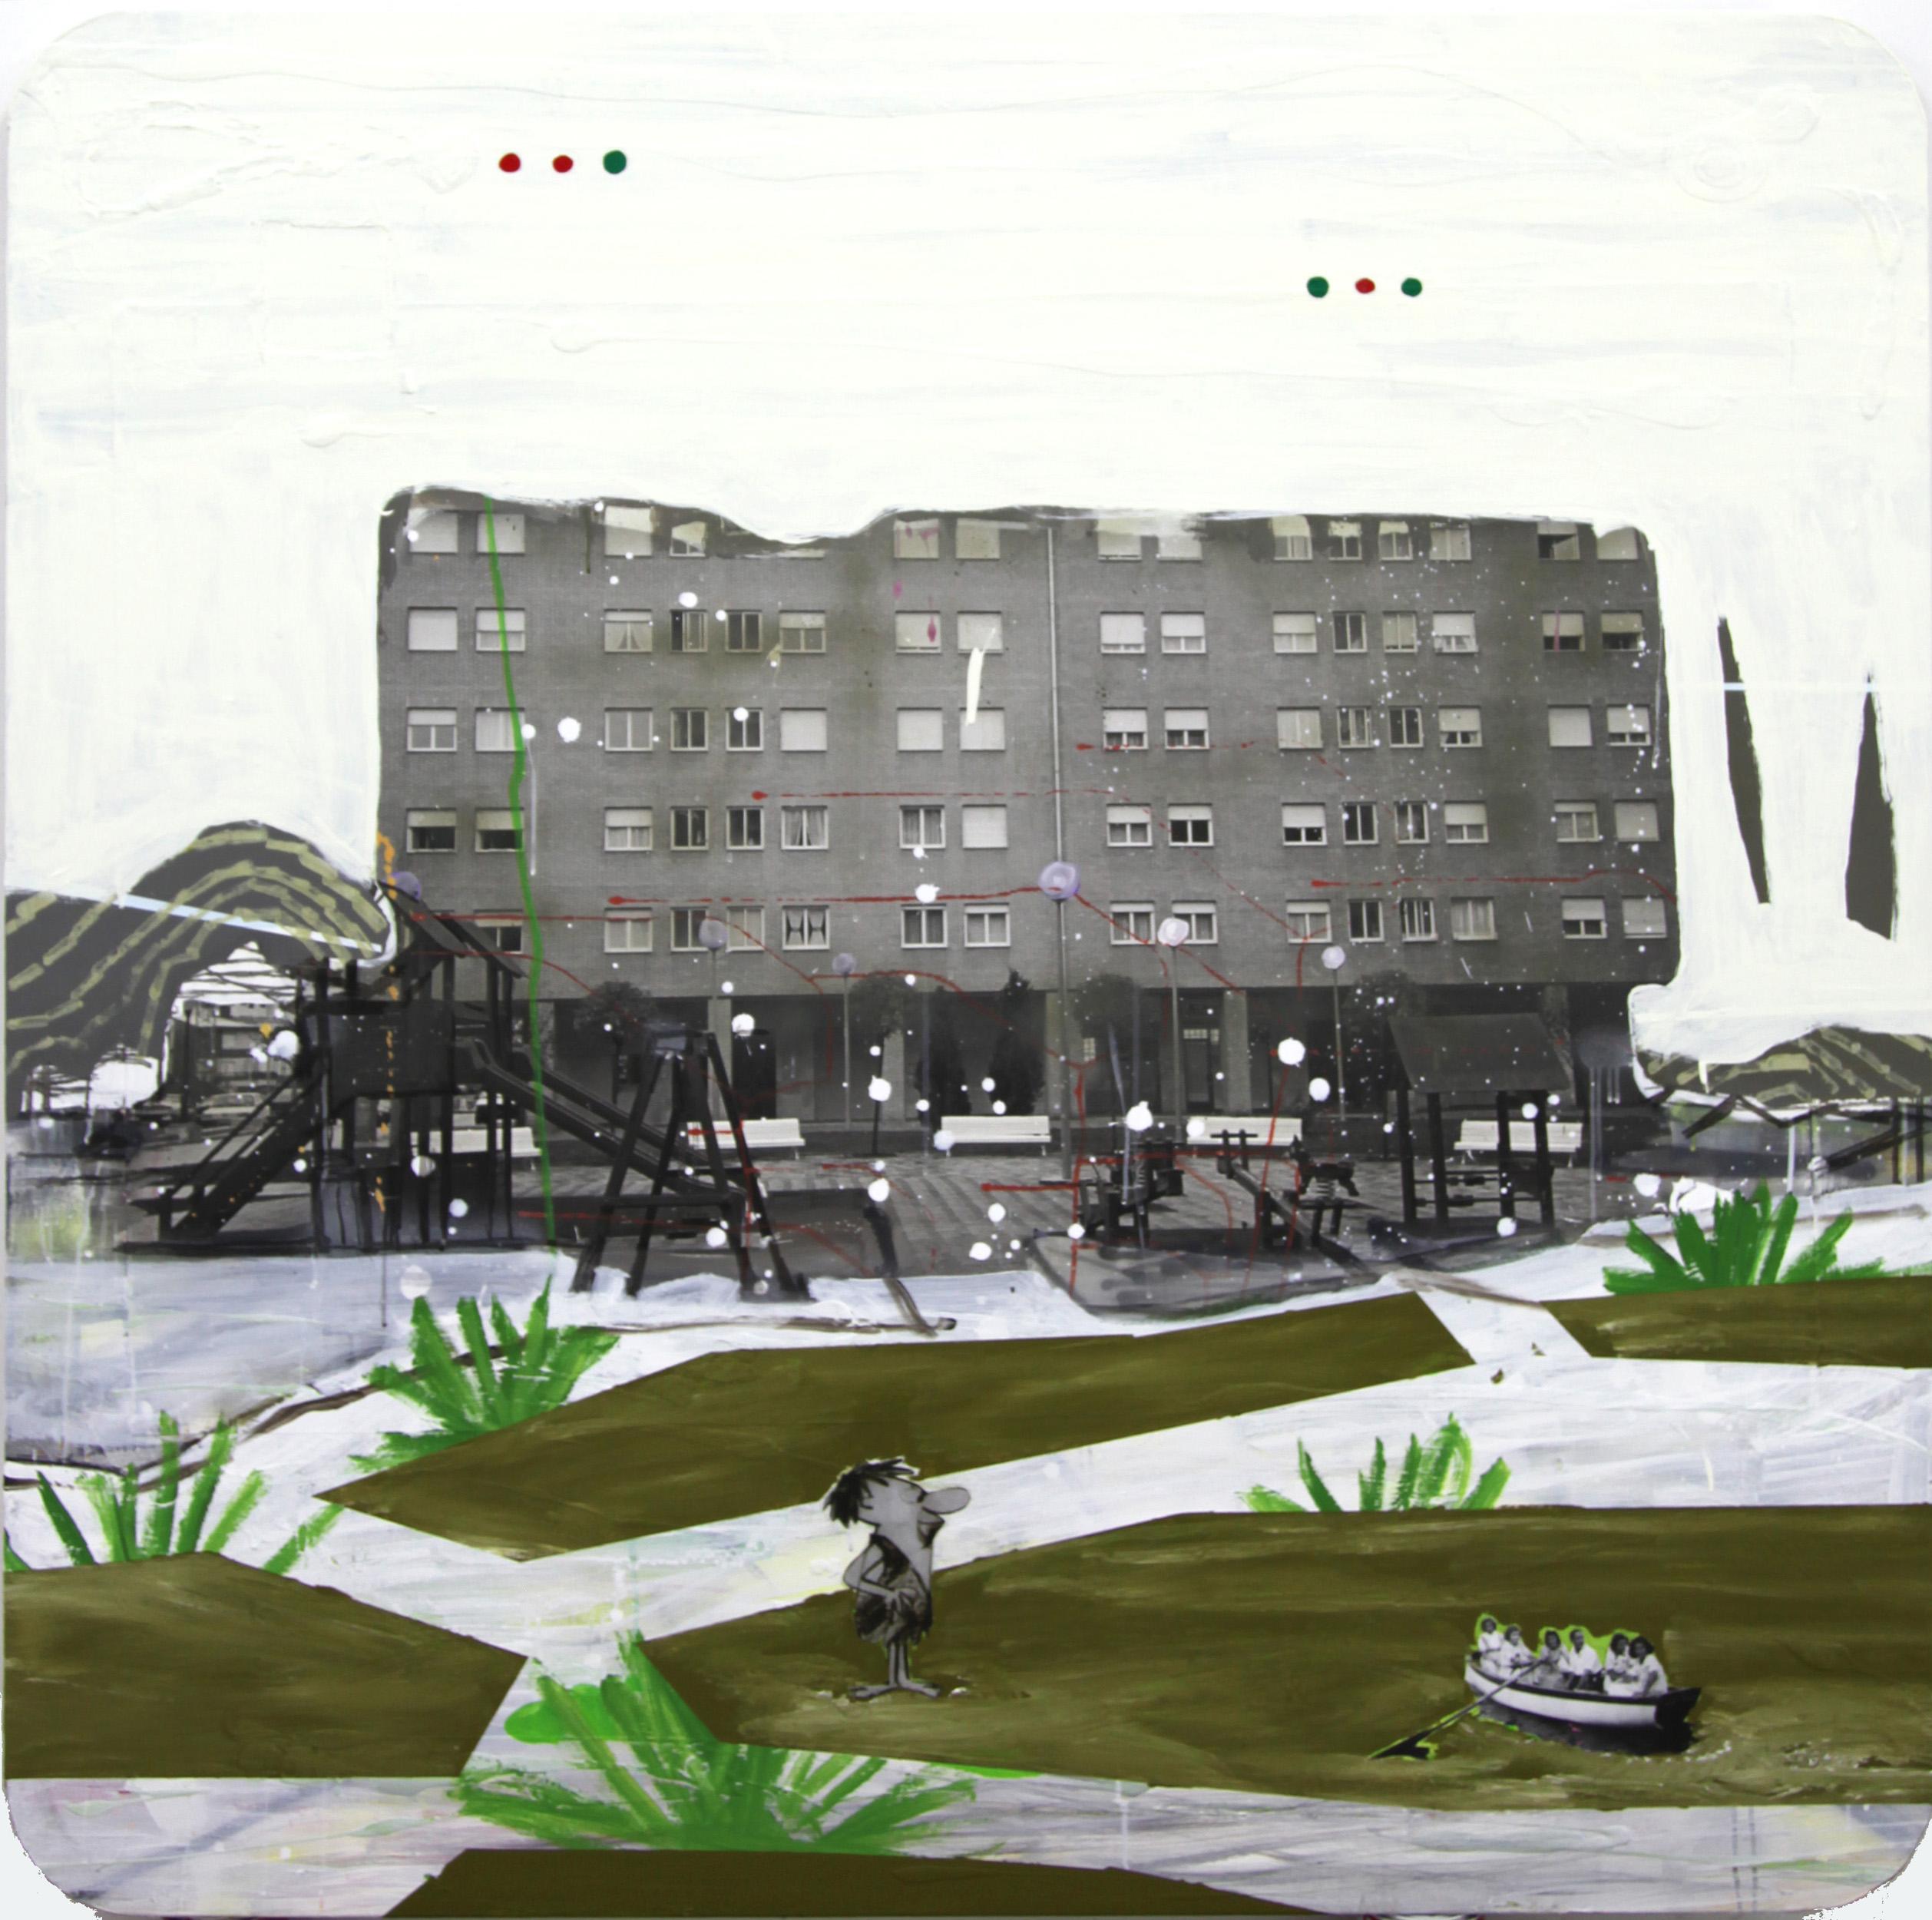 Vueltas del paisaje, 2012, mixed media on canvas, 150 x 150 cm.